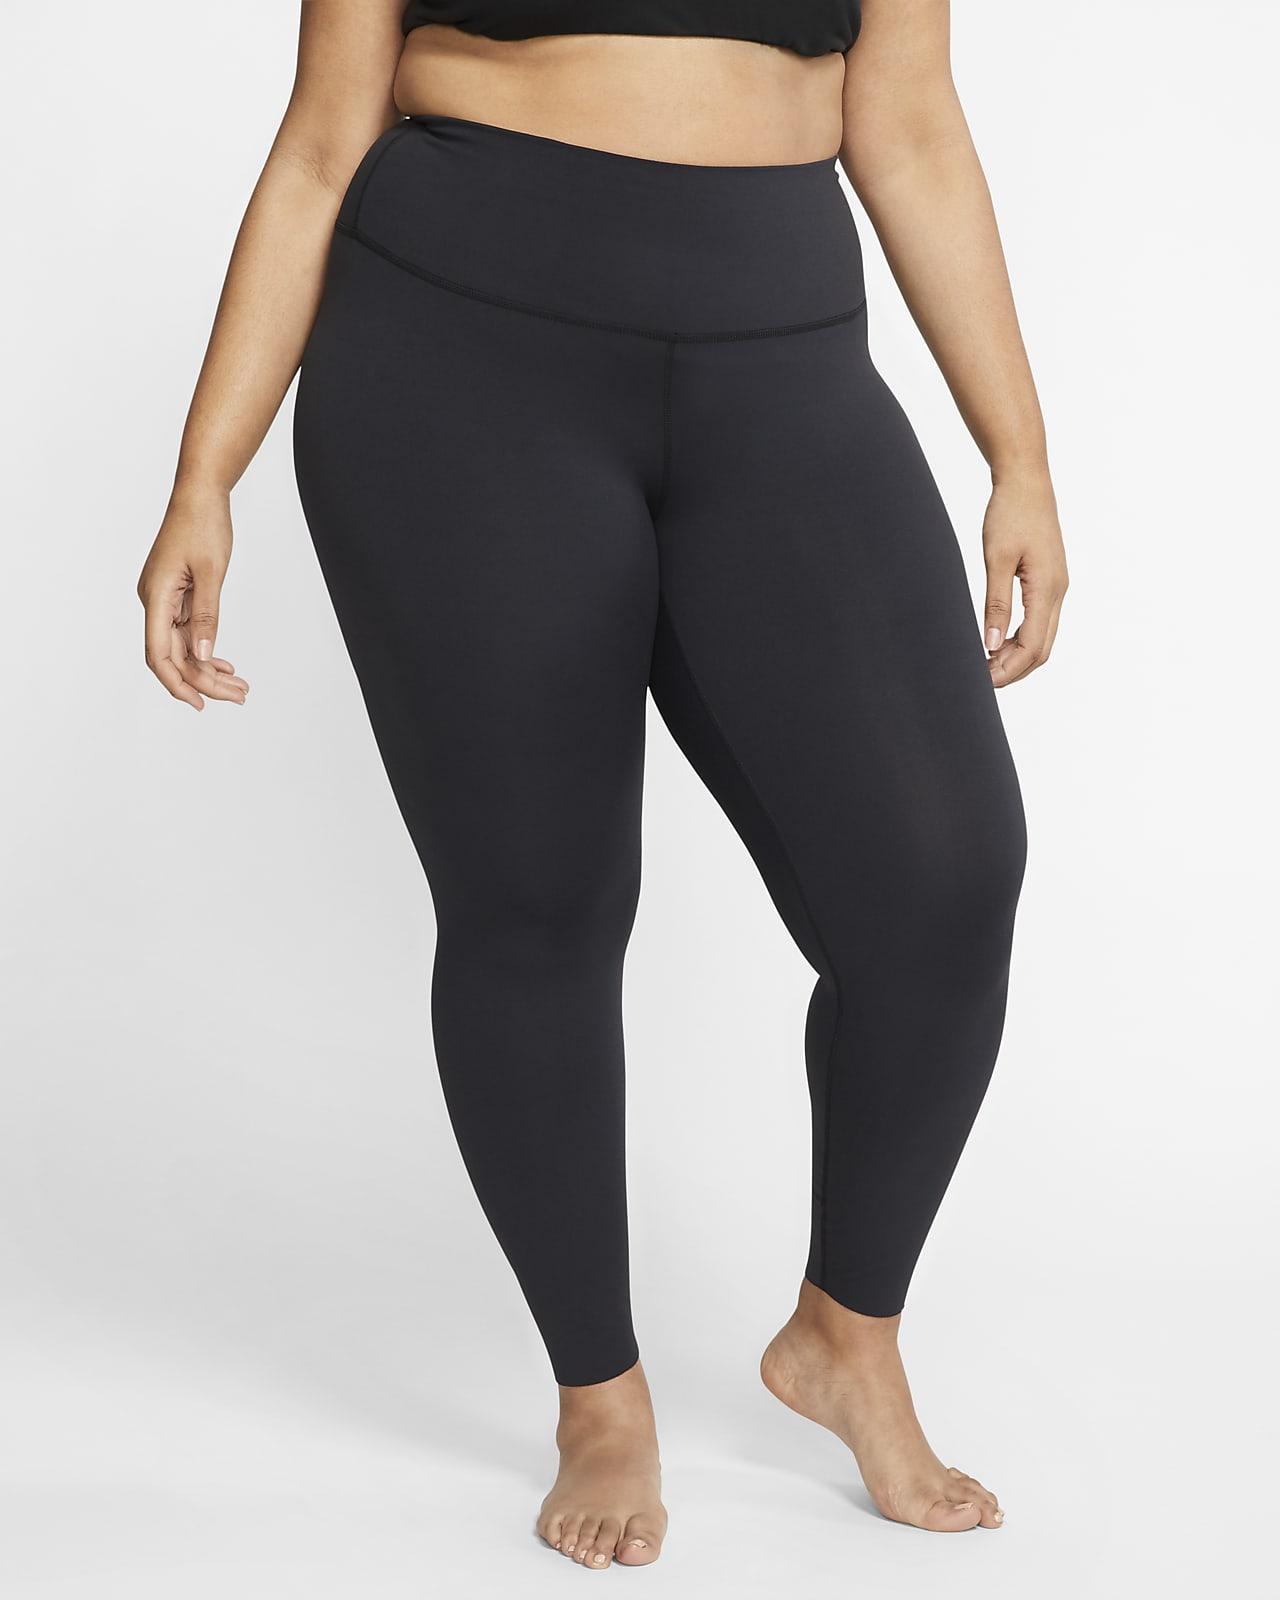 Nike Yoga Luxe Leggings de 7/8 con tejido Infinalon y talle alto (Talla grande) - Mujer